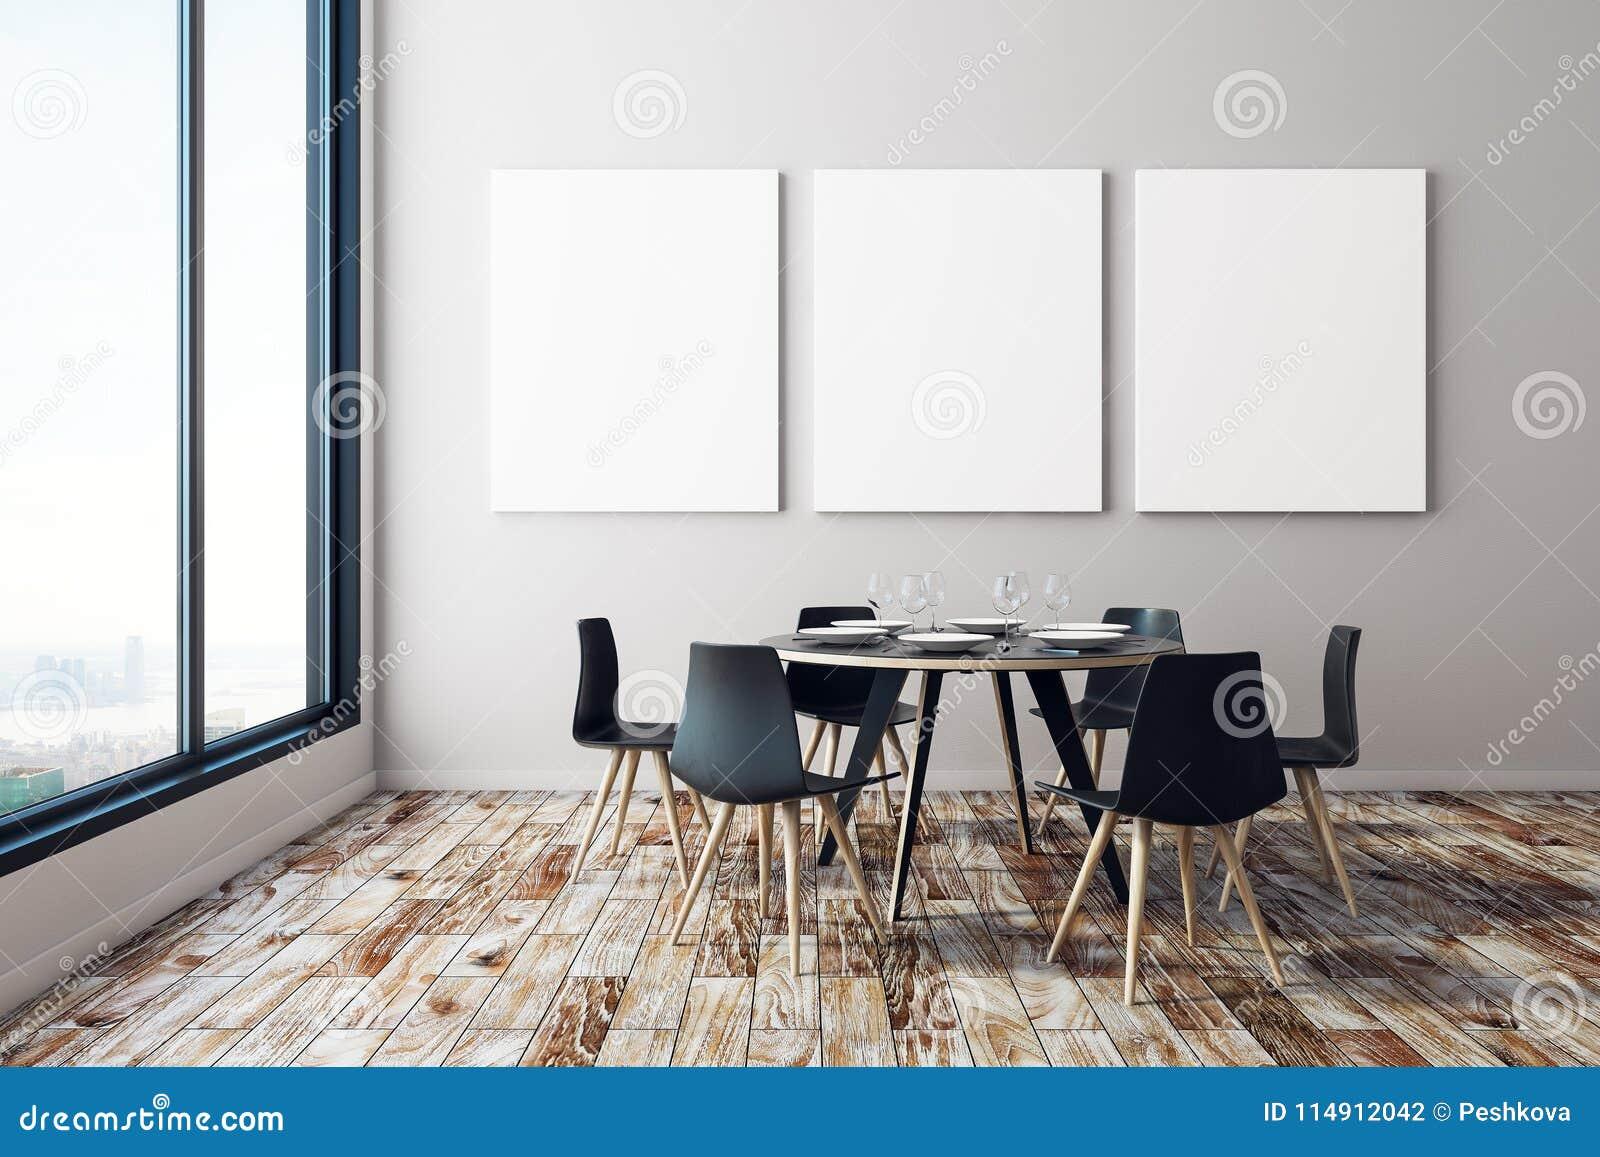 Dining Room With Empty Billboard Stock Illustration Illustration Of Living Interior 114912042